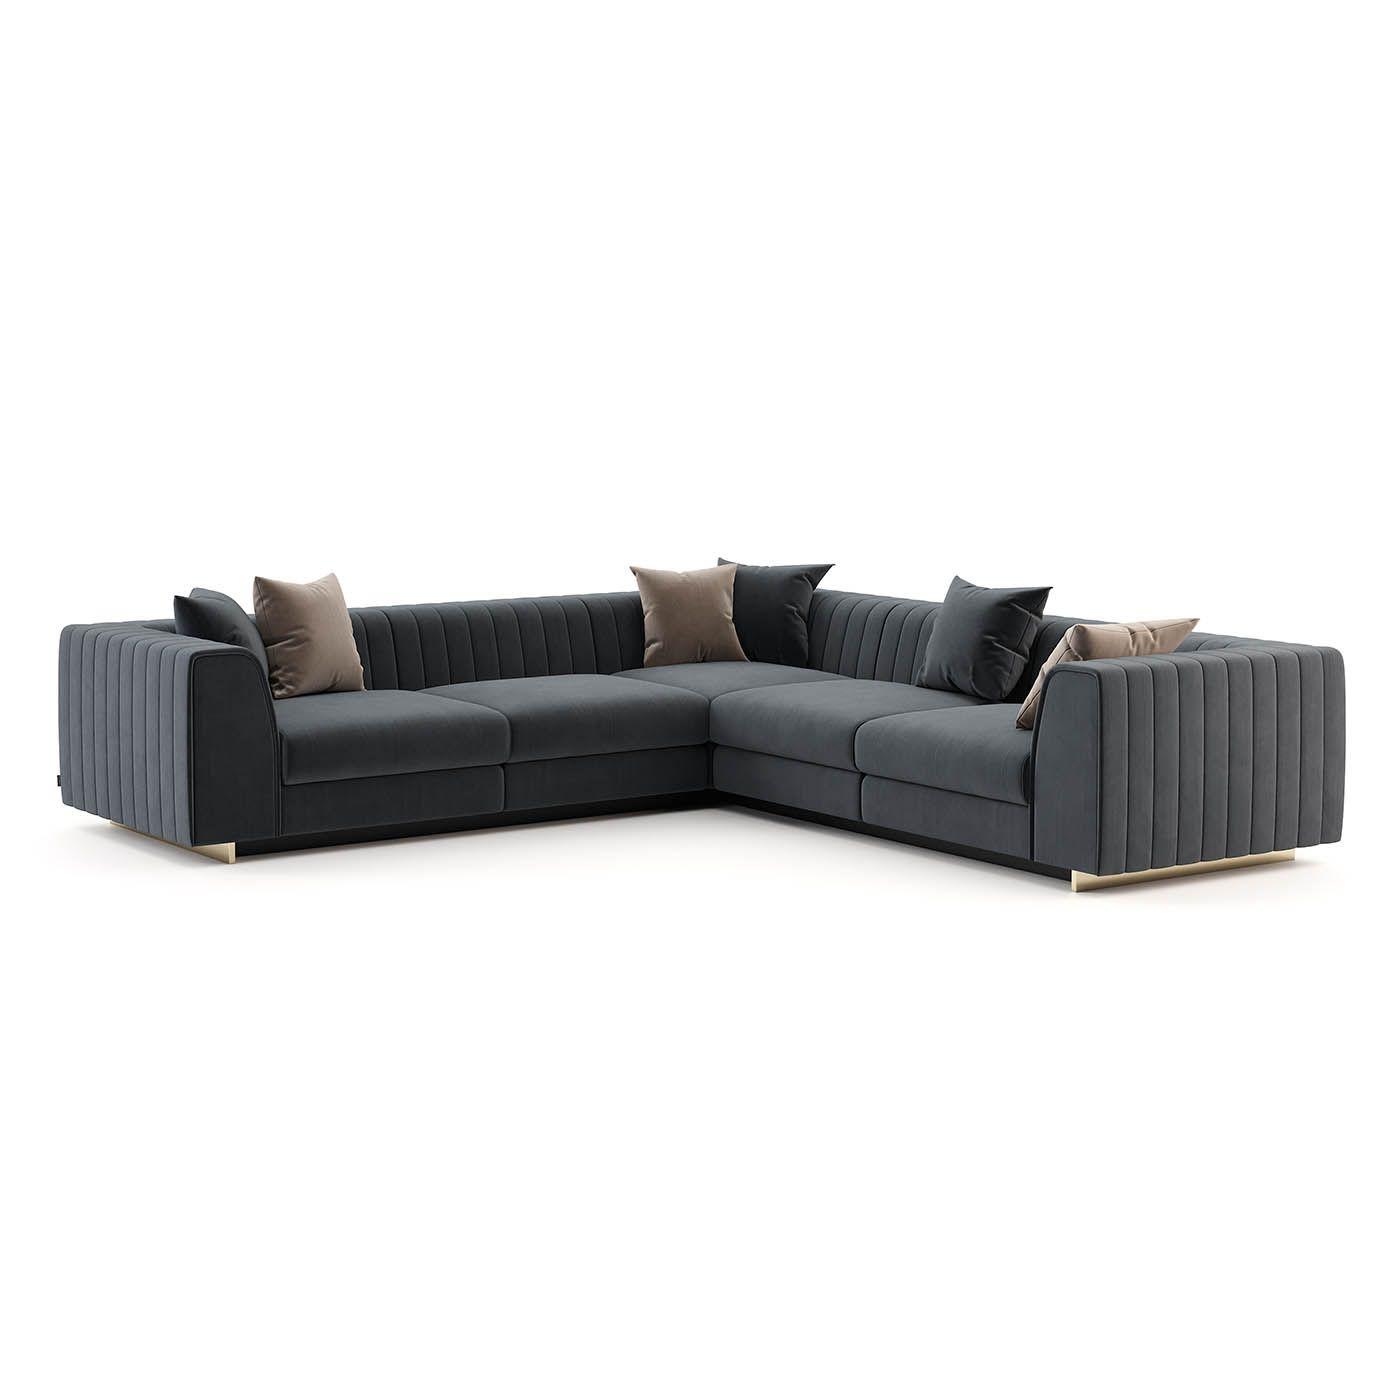 Harry Sofa Laskasas Decorate Life 2019 New Collection Corner Sofa Design Living Room Sofa Design Luxury Sofa Design